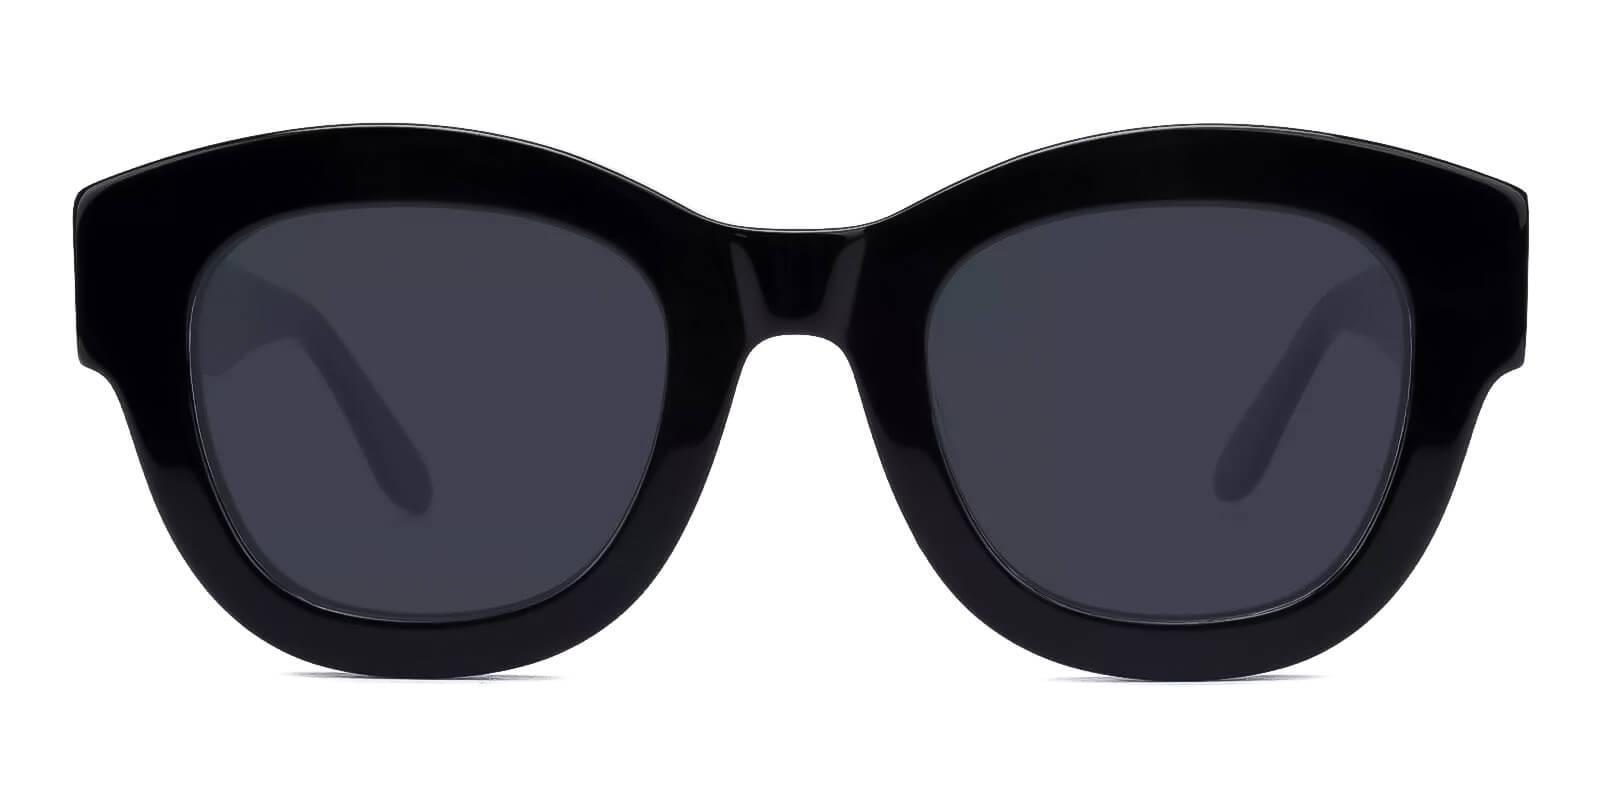 Meridian Black Acetate Fashion , Sunglasses , UniversalBridgeFit Frames from ABBE Glasses